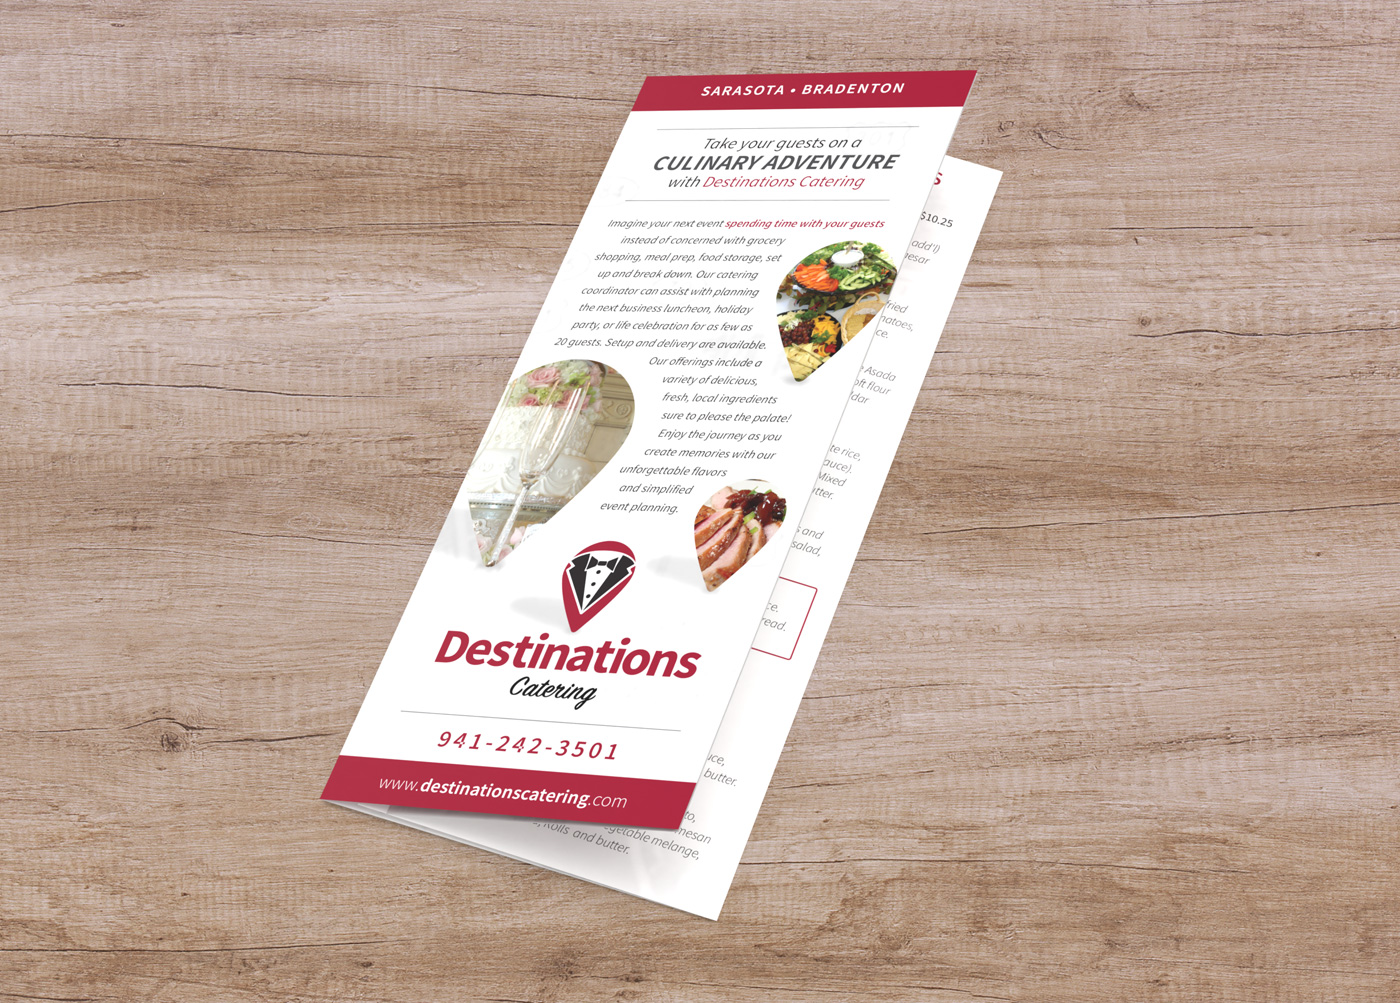 Destinations Catering Menu Design